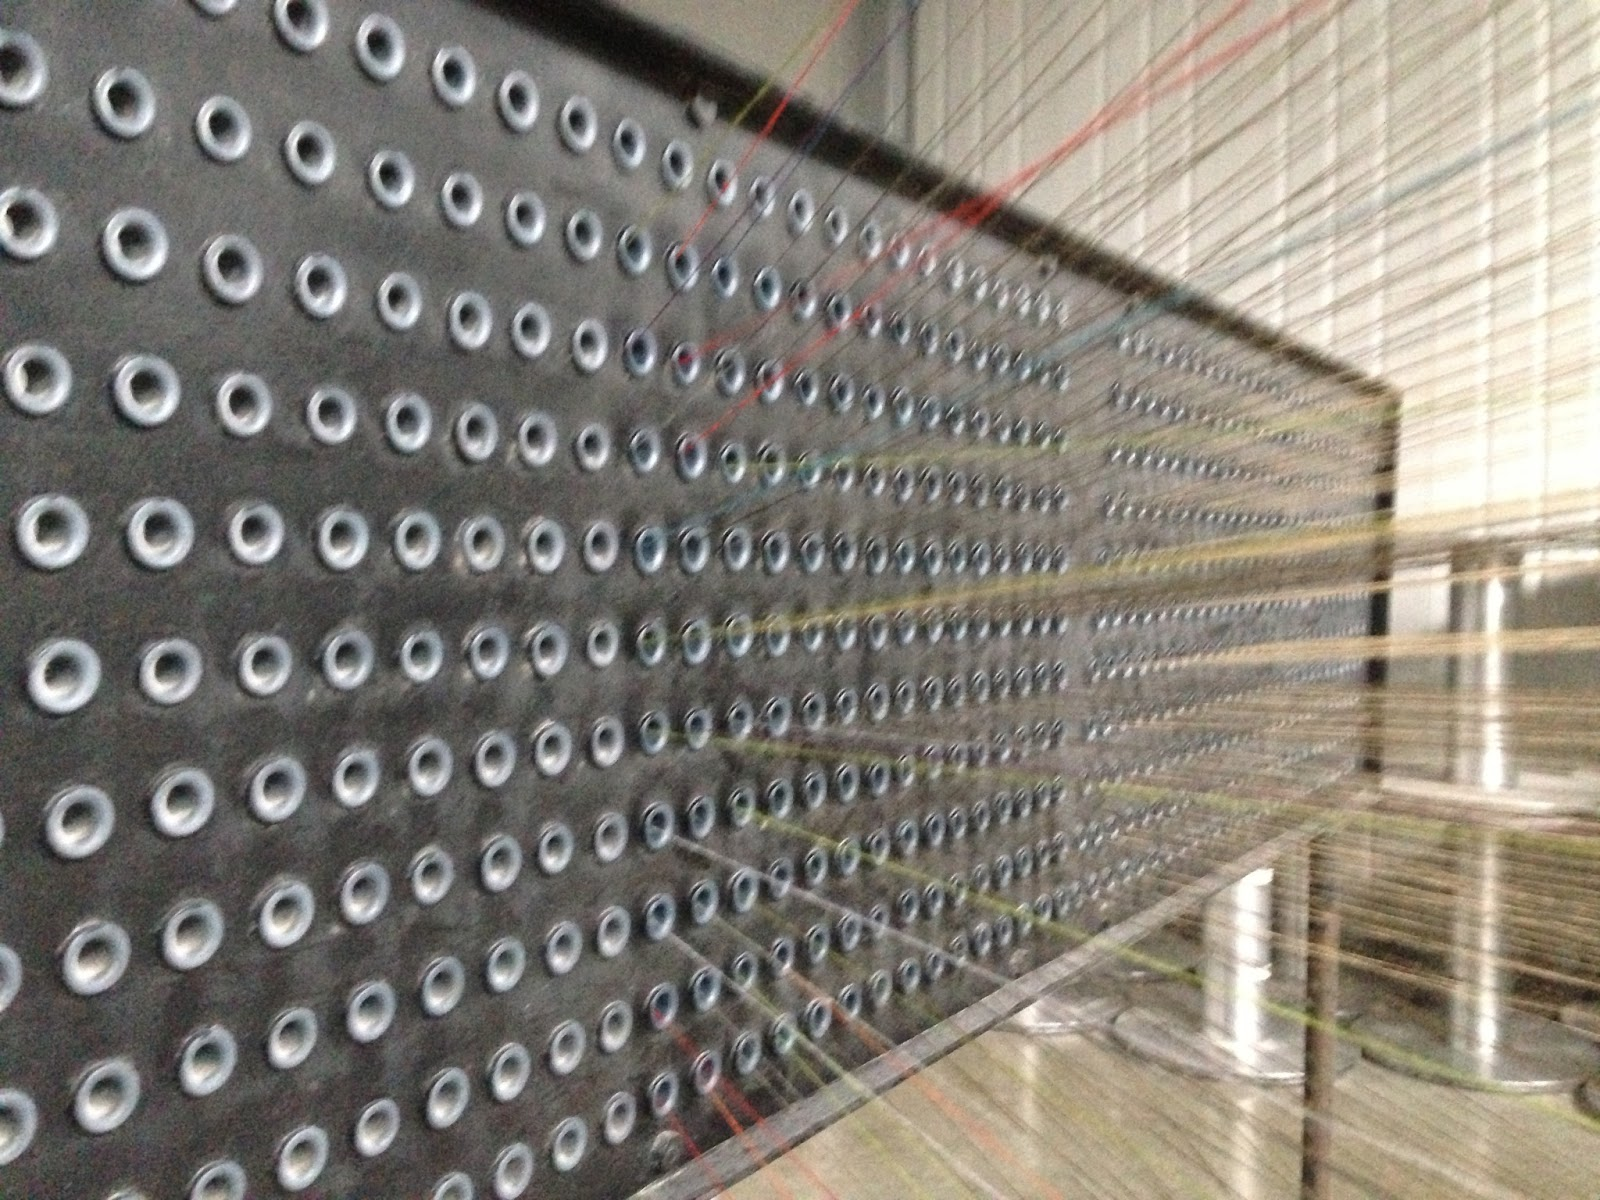 agence d 39 architecture int rieure parallel paris parallel visite l 39 usine texaa. Black Bedroom Furniture Sets. Home Design Ideas